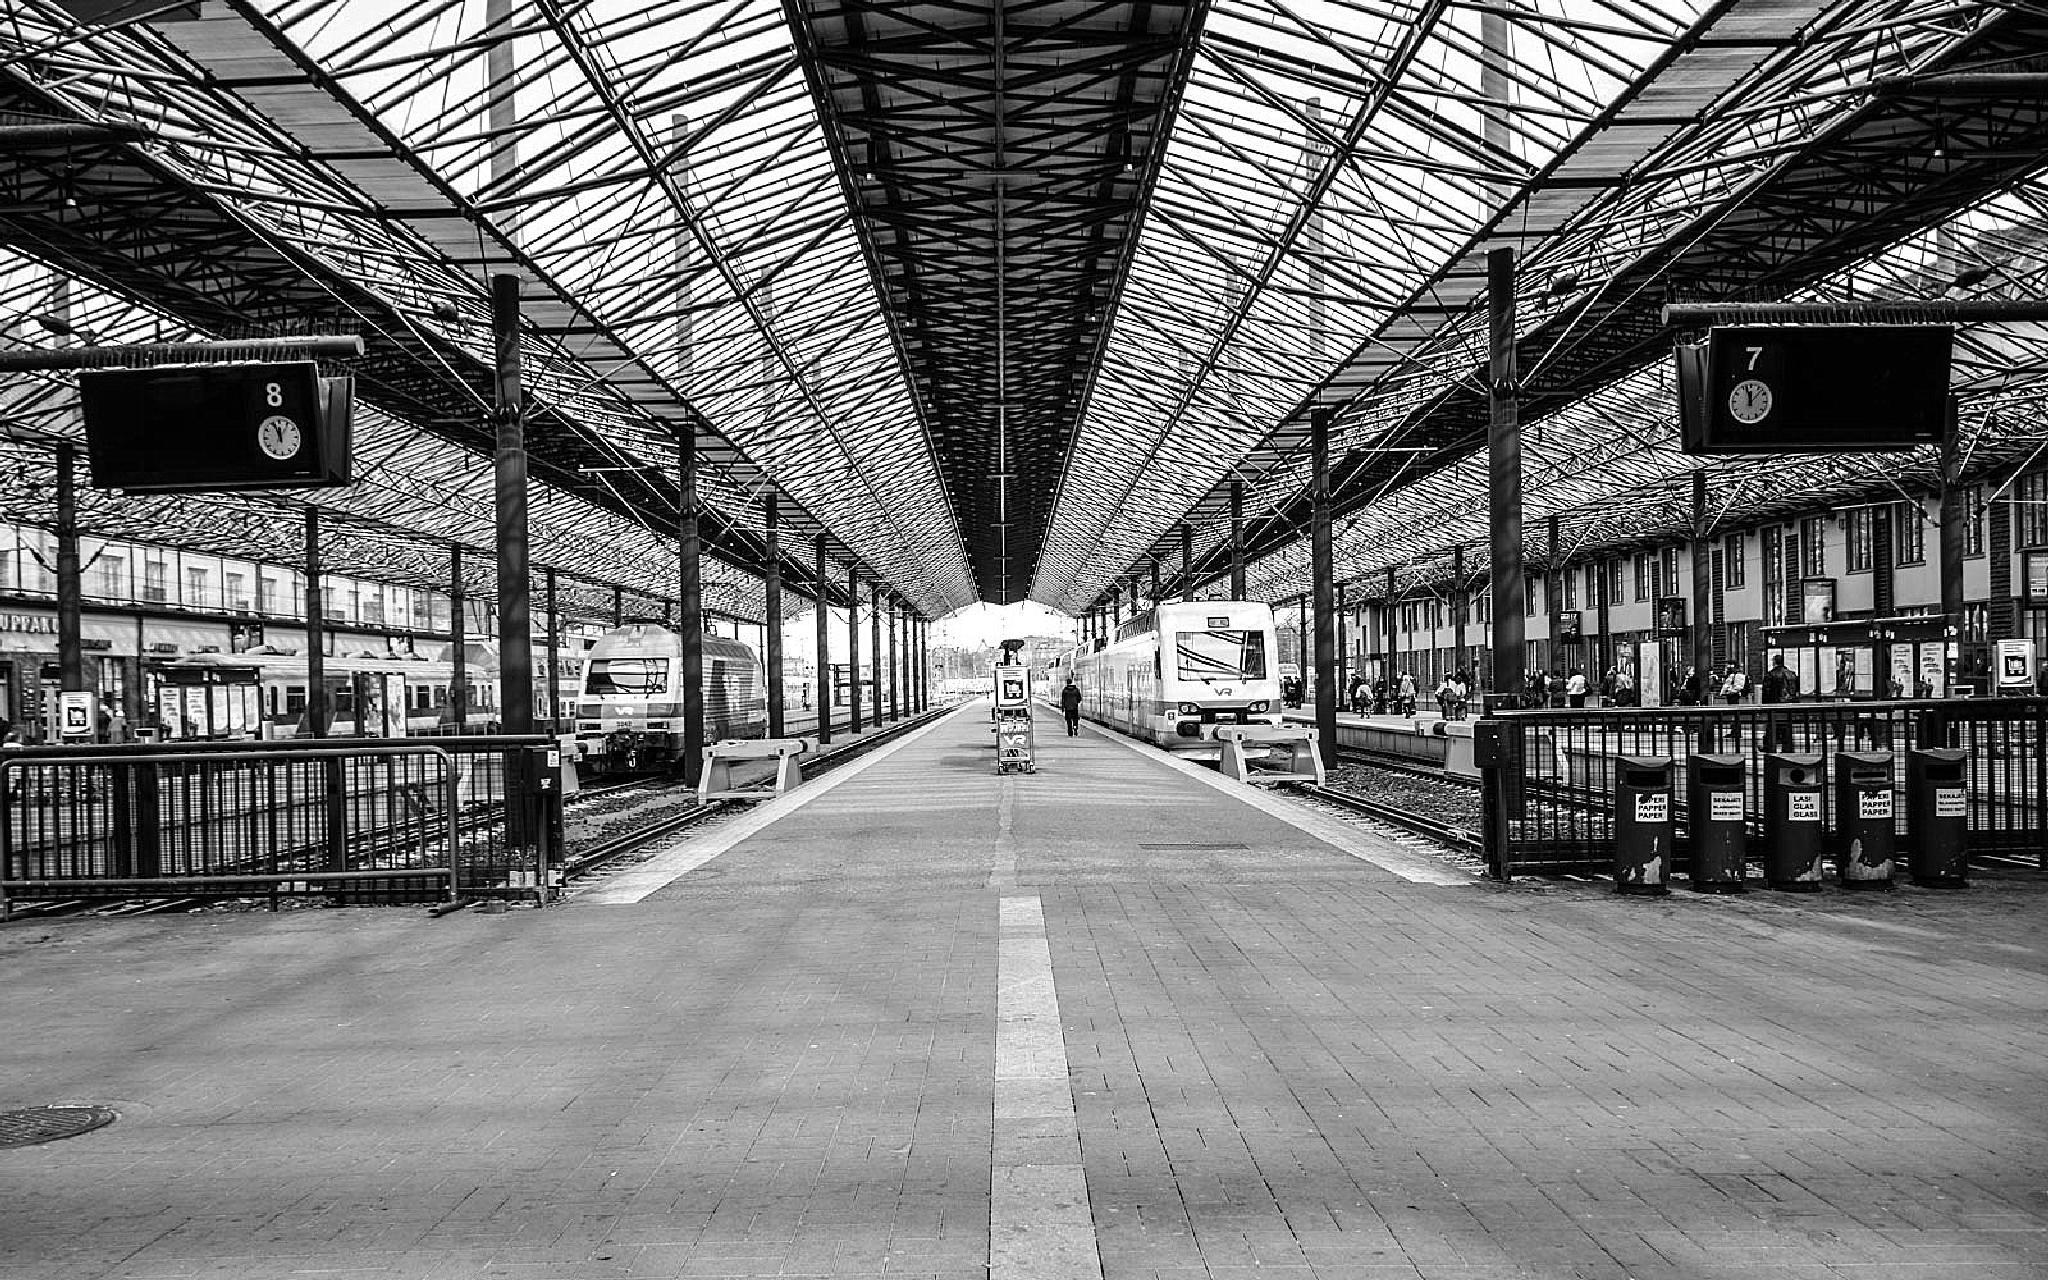 Platform No. 7 & 8 - Black & White  by aronrielle